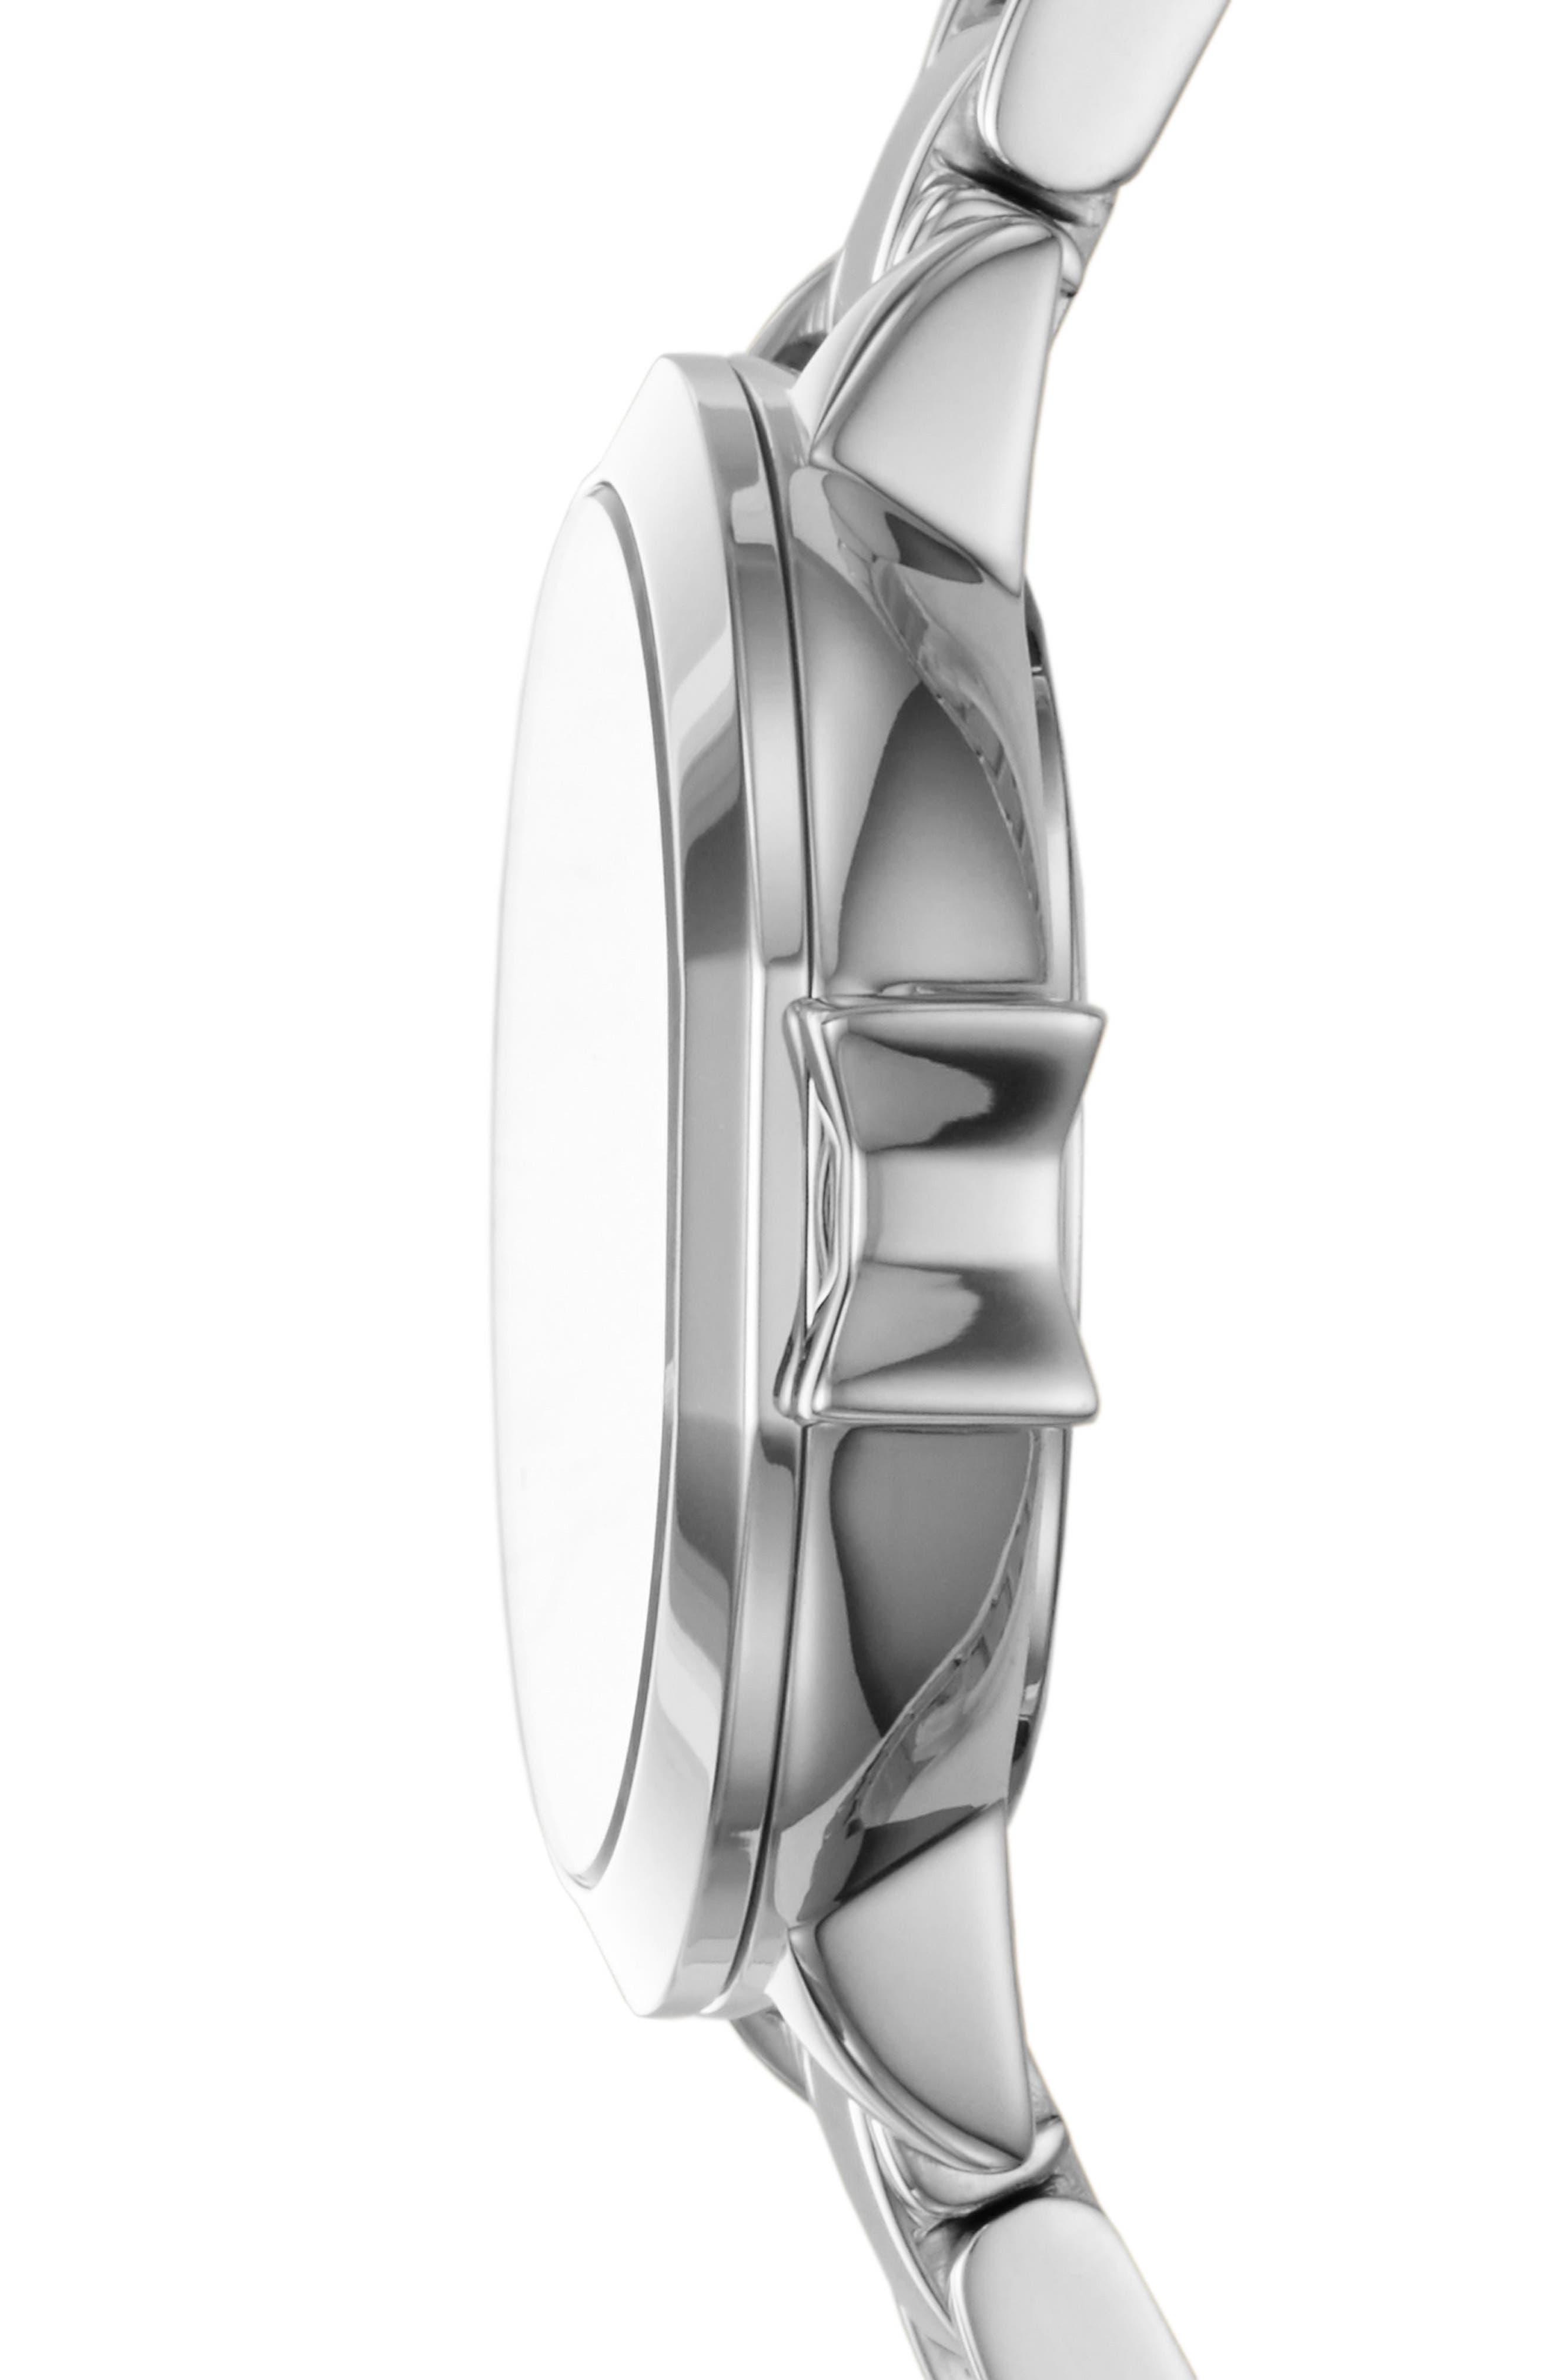 KATE SPADE NEW YORK, park row bracelet watch, 24mm, Alternate thumbnail 2, color, SILVER/ MOP/ SILVER